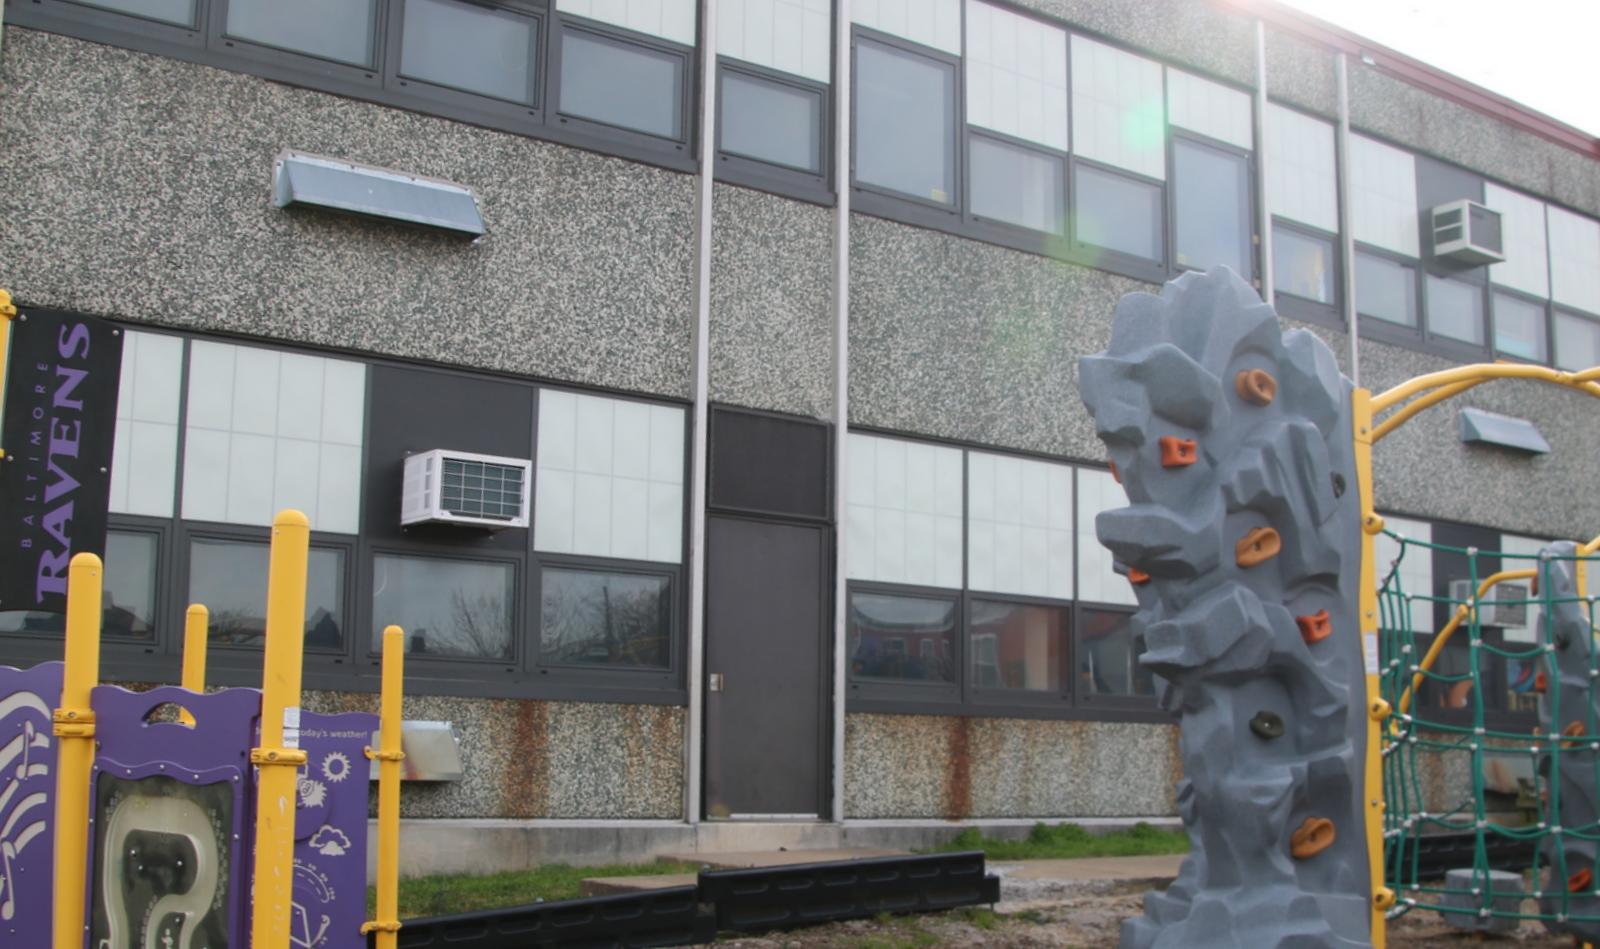 Collington Square Elementary (Fern Shen)